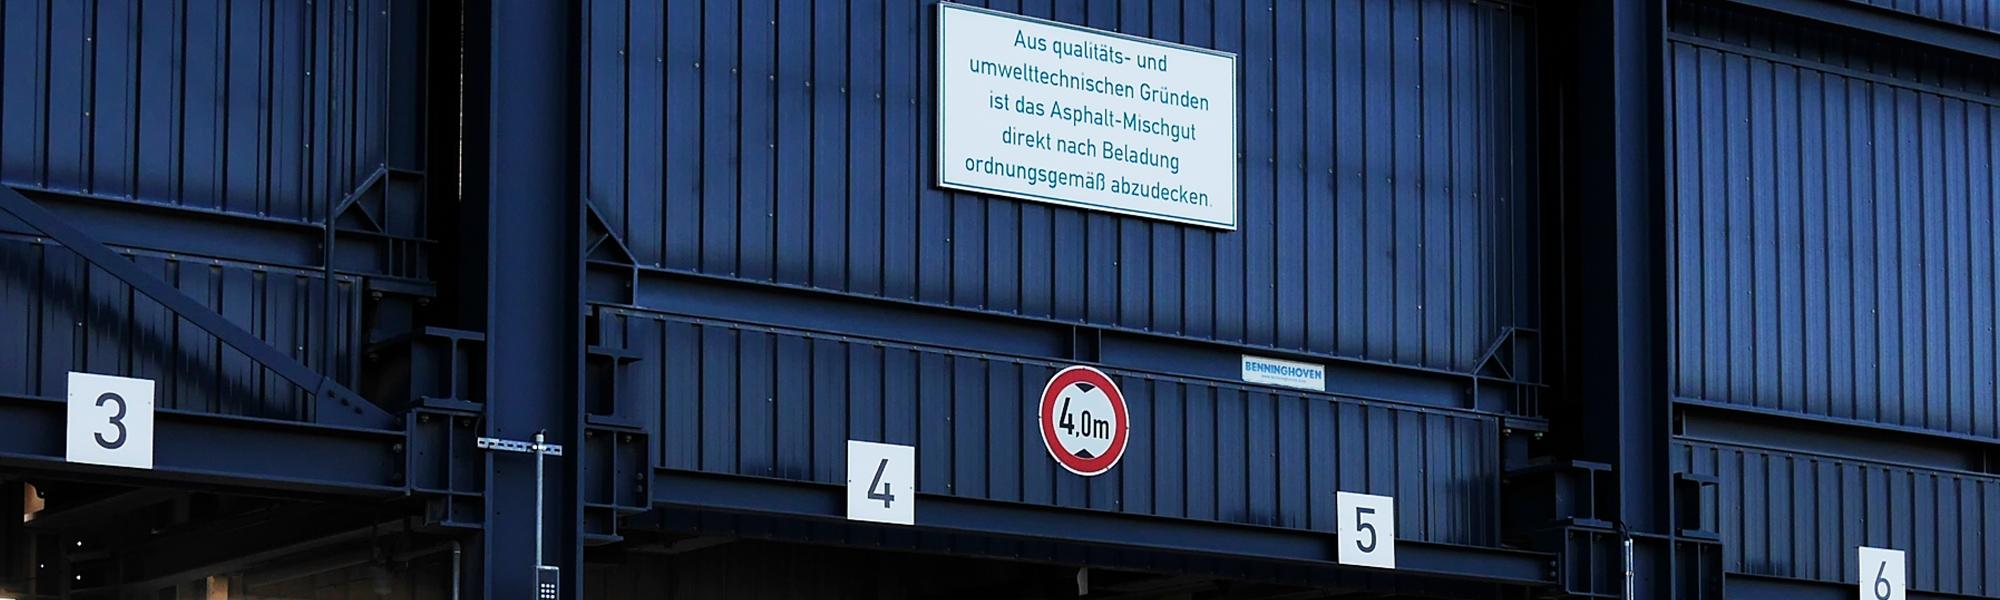 AM-NRW-Asphalt-Mischgut